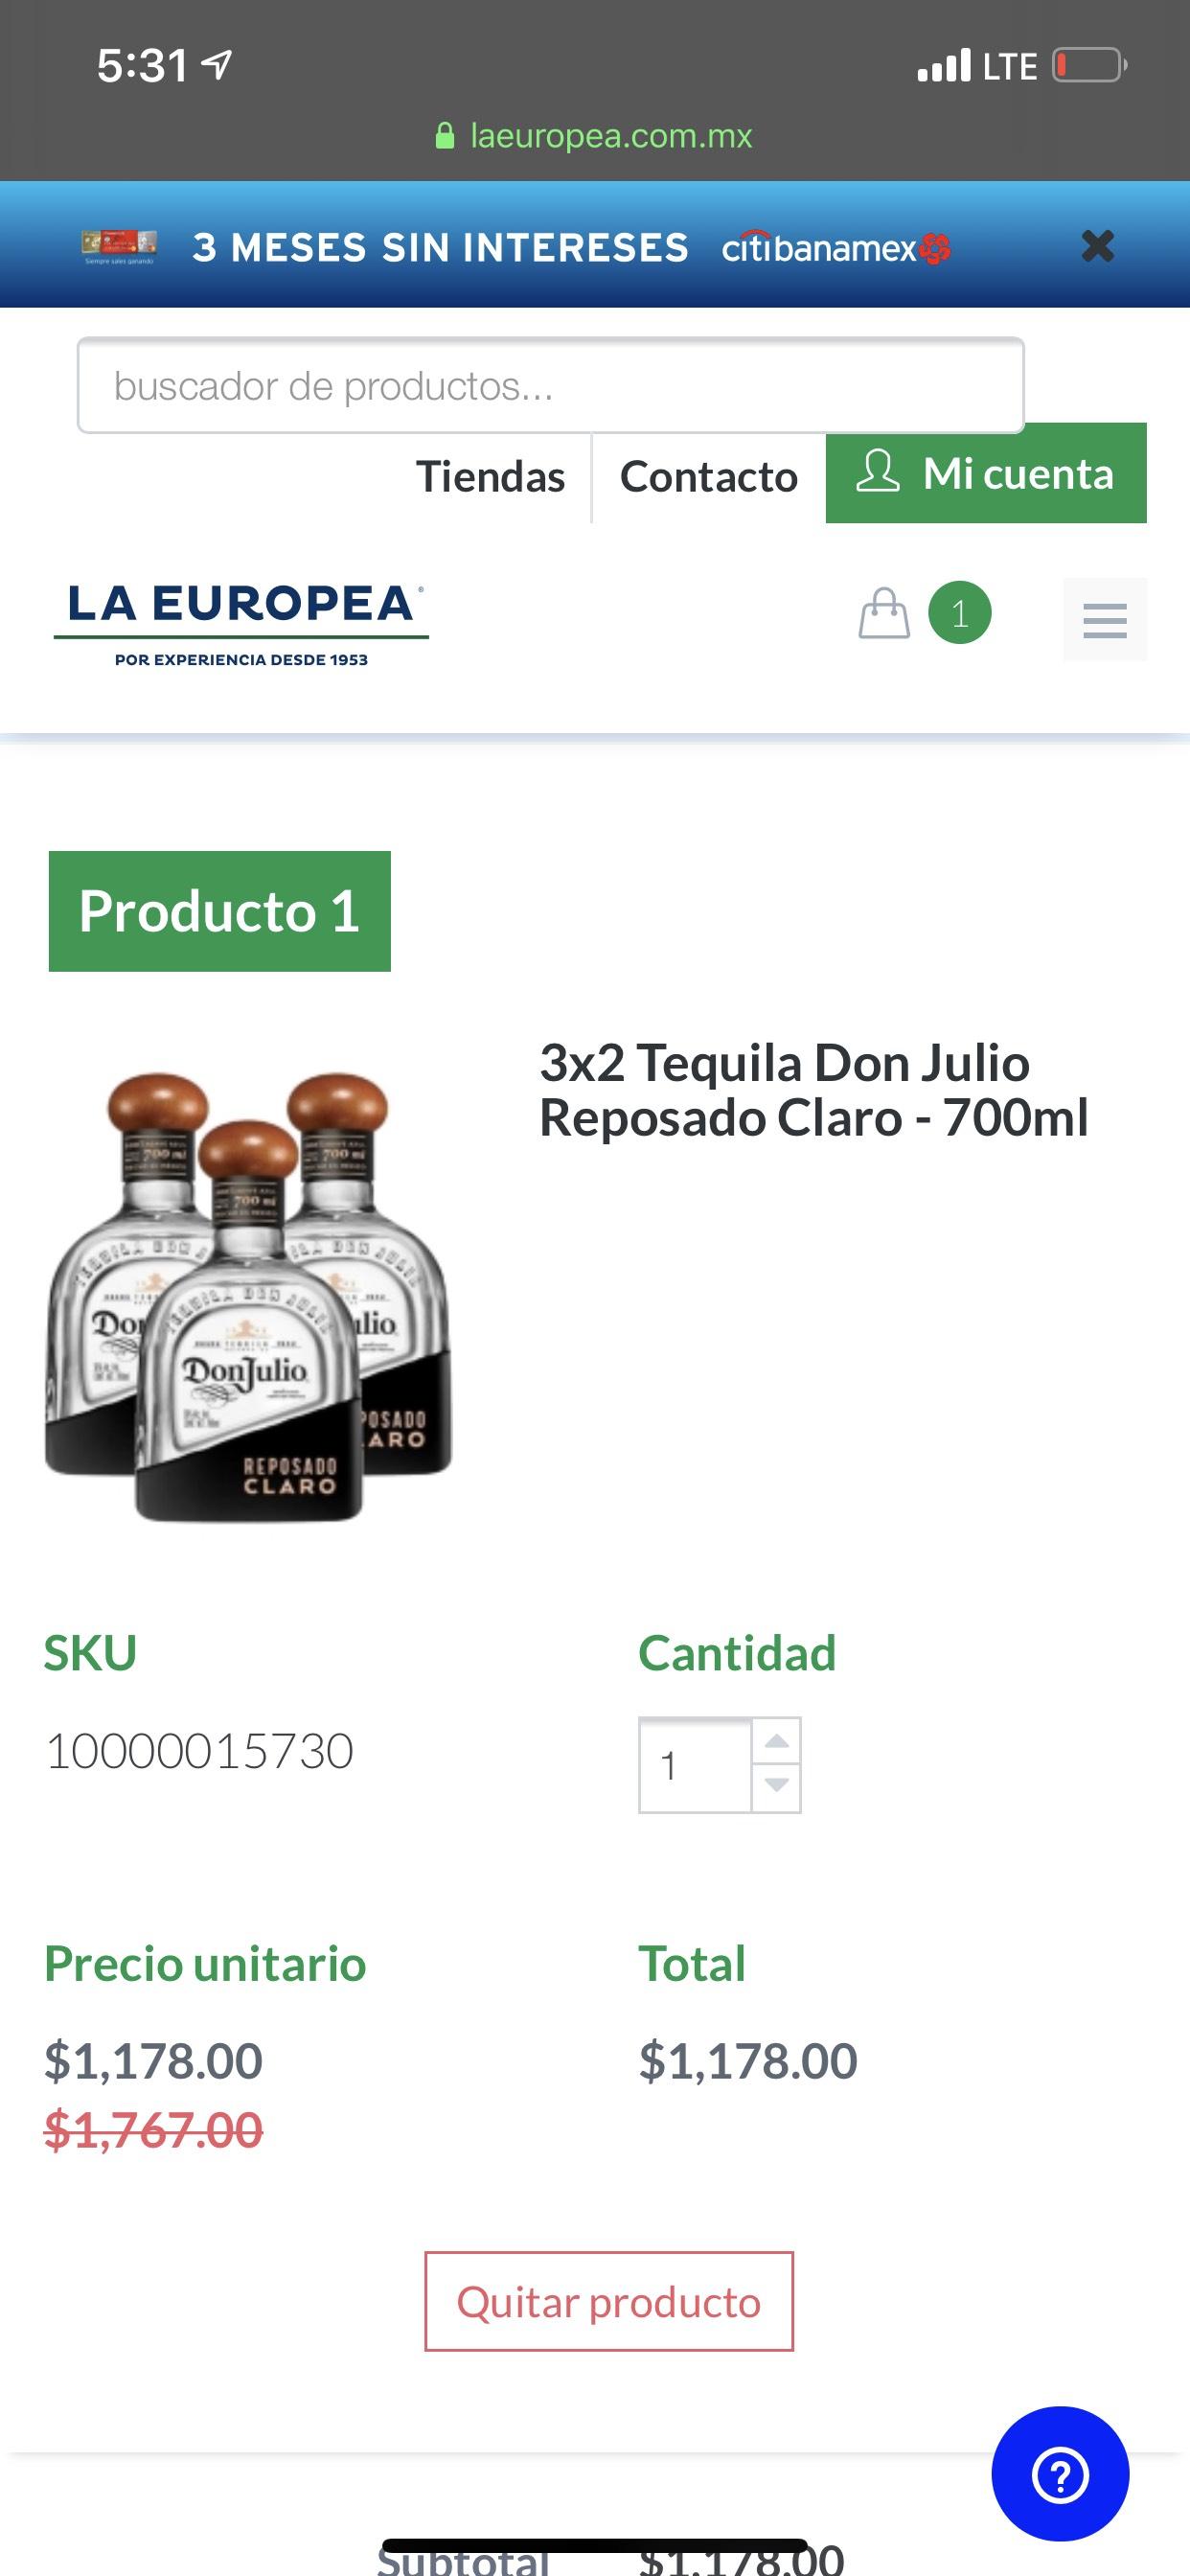 La Europea: 3 x 2 en Tequila Don Julio Reposado Claro de 700ml